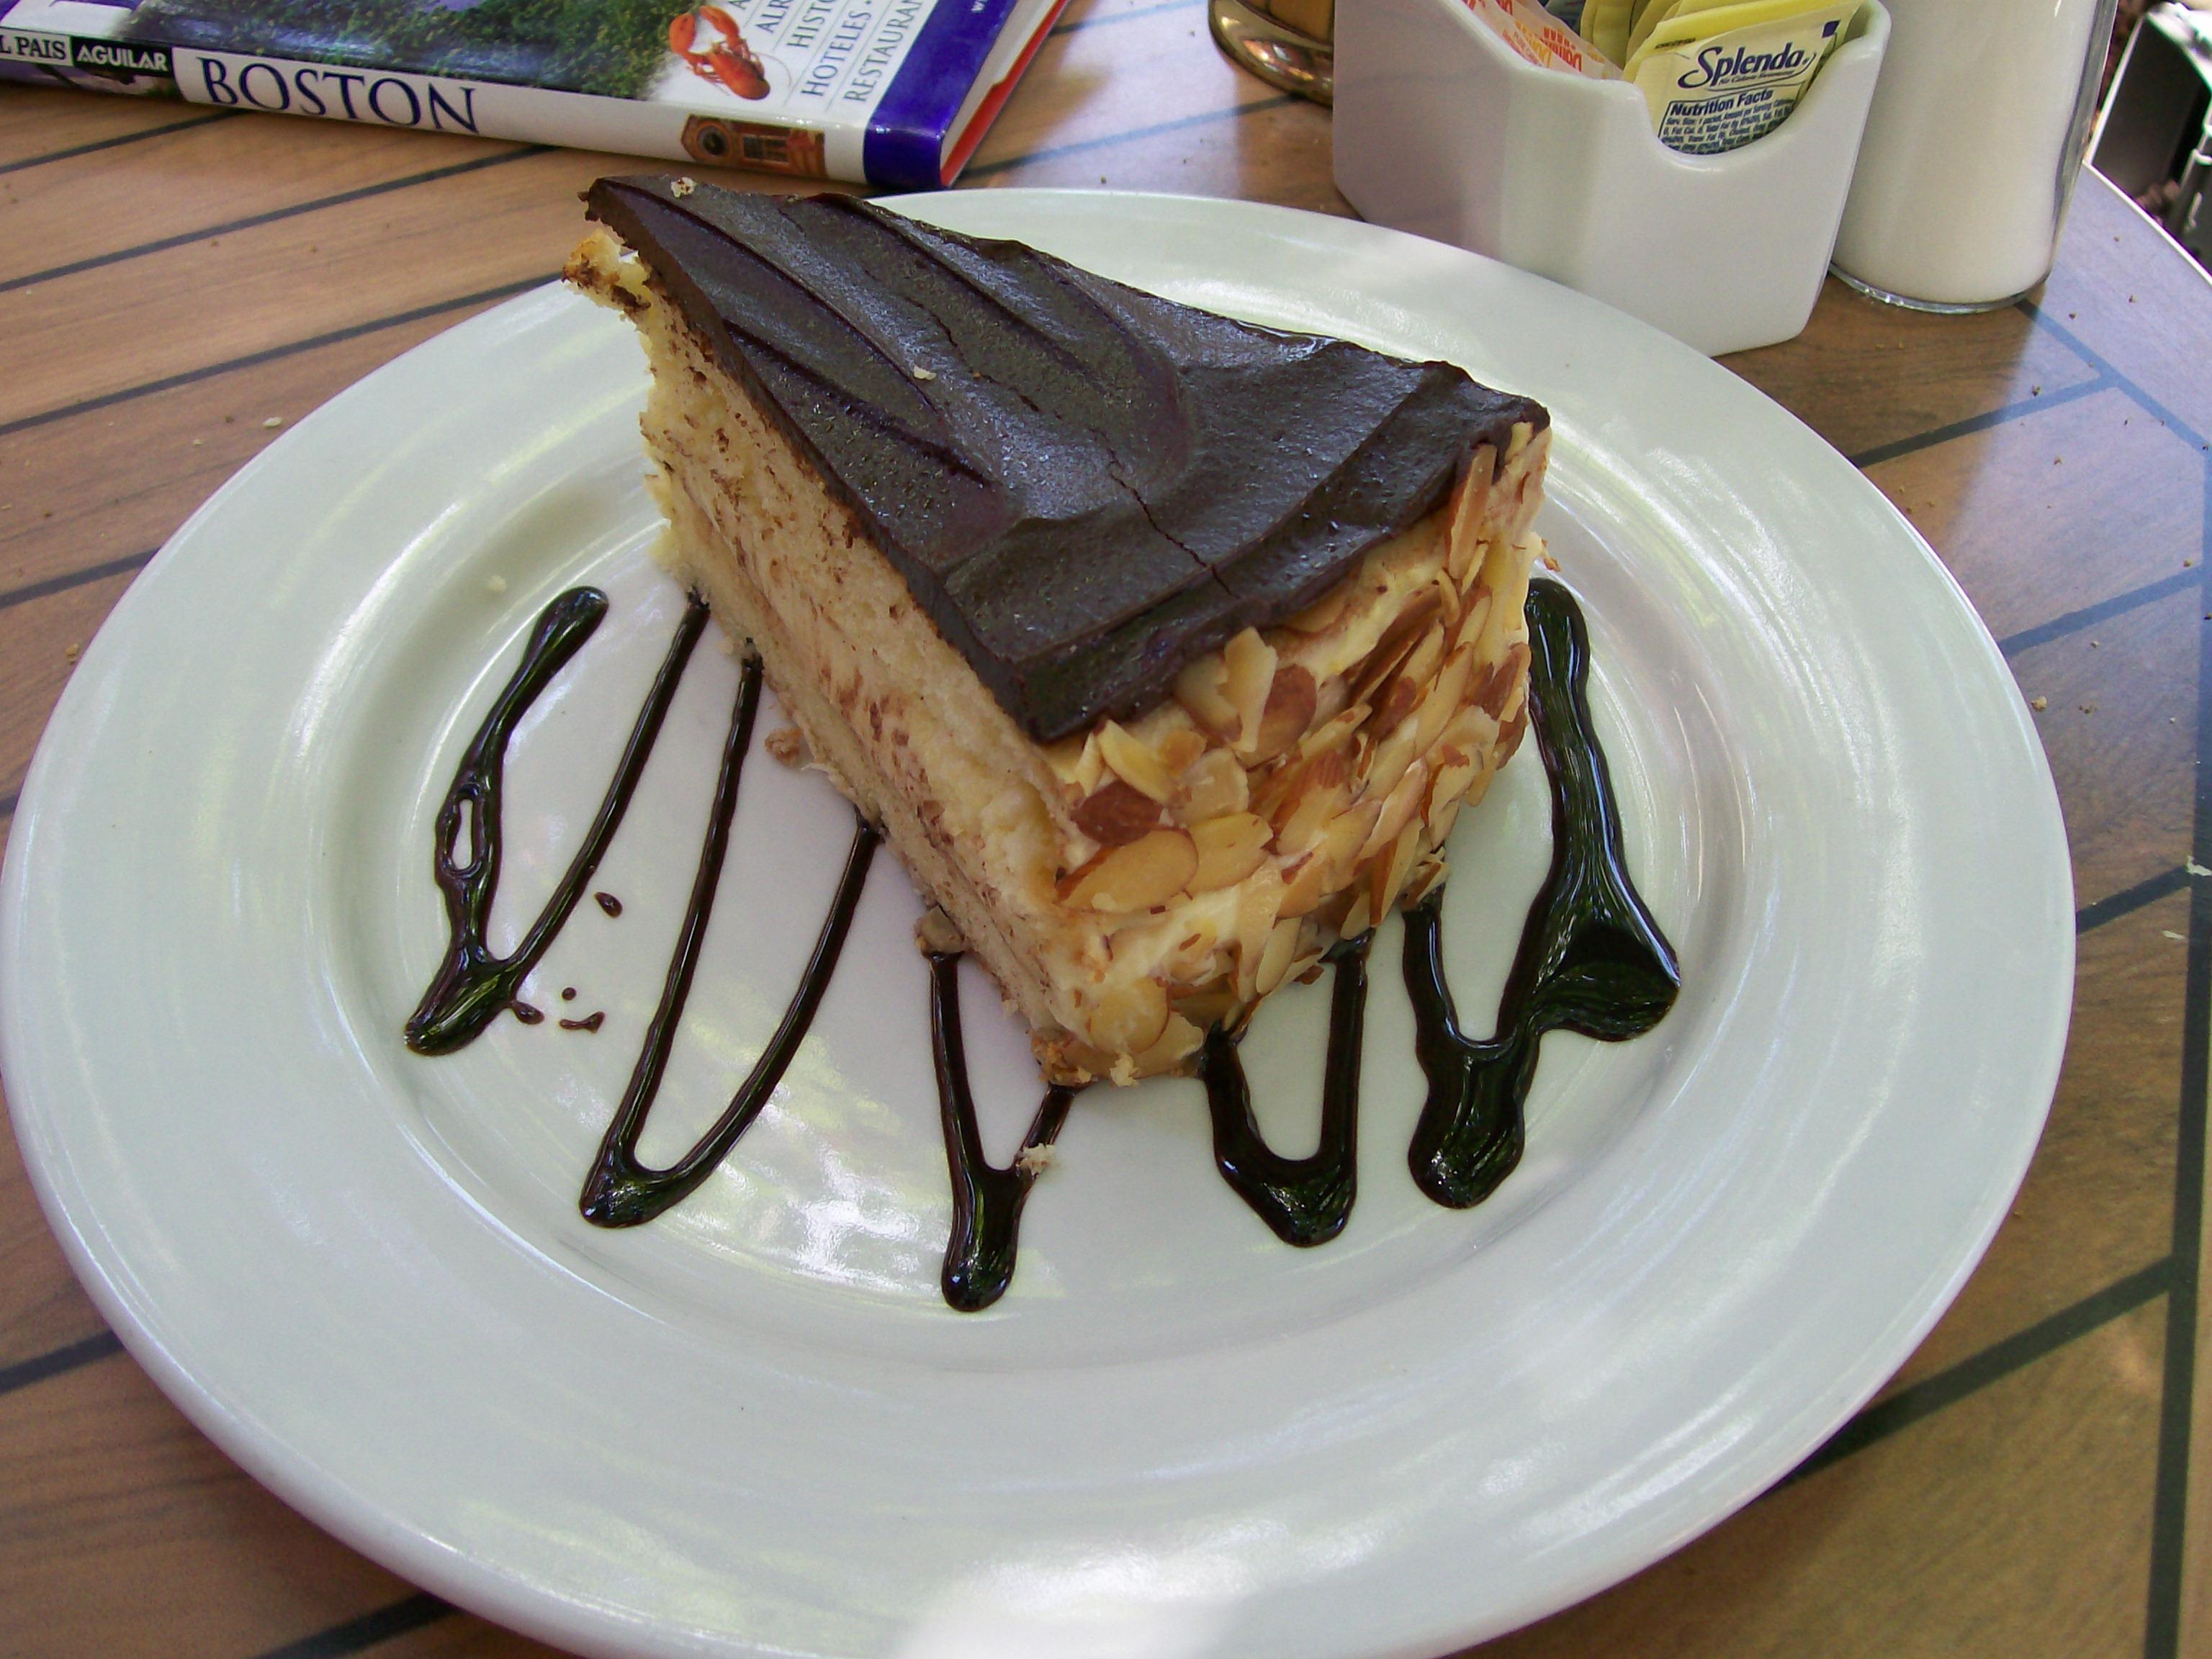 boston cream pie with chocolate drizzle.jpg